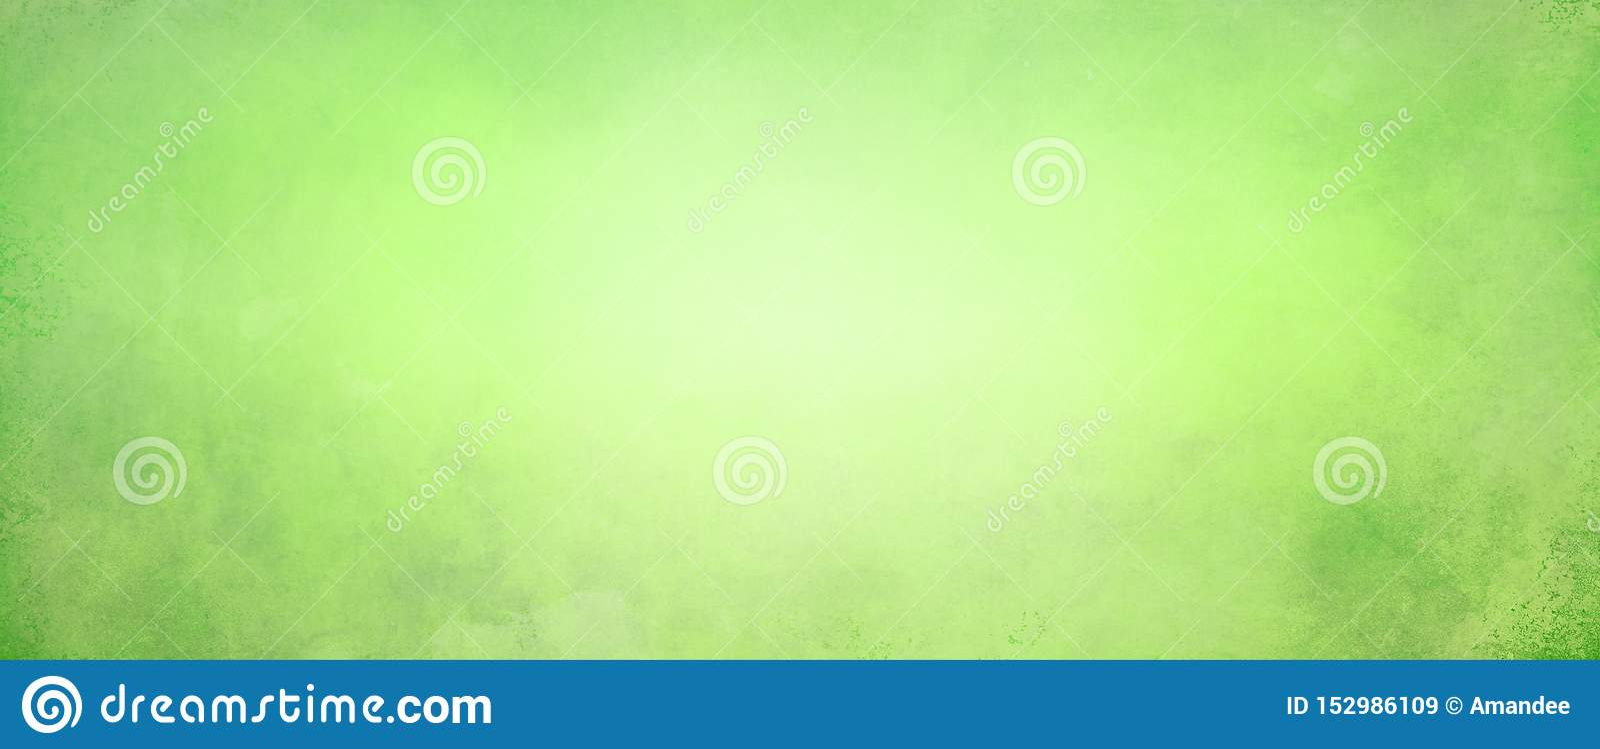 Abstracte geelgroene achtergrond met zacht helder centrum die met donkergroene grens met oude uitstekende grungetextuur gloeien